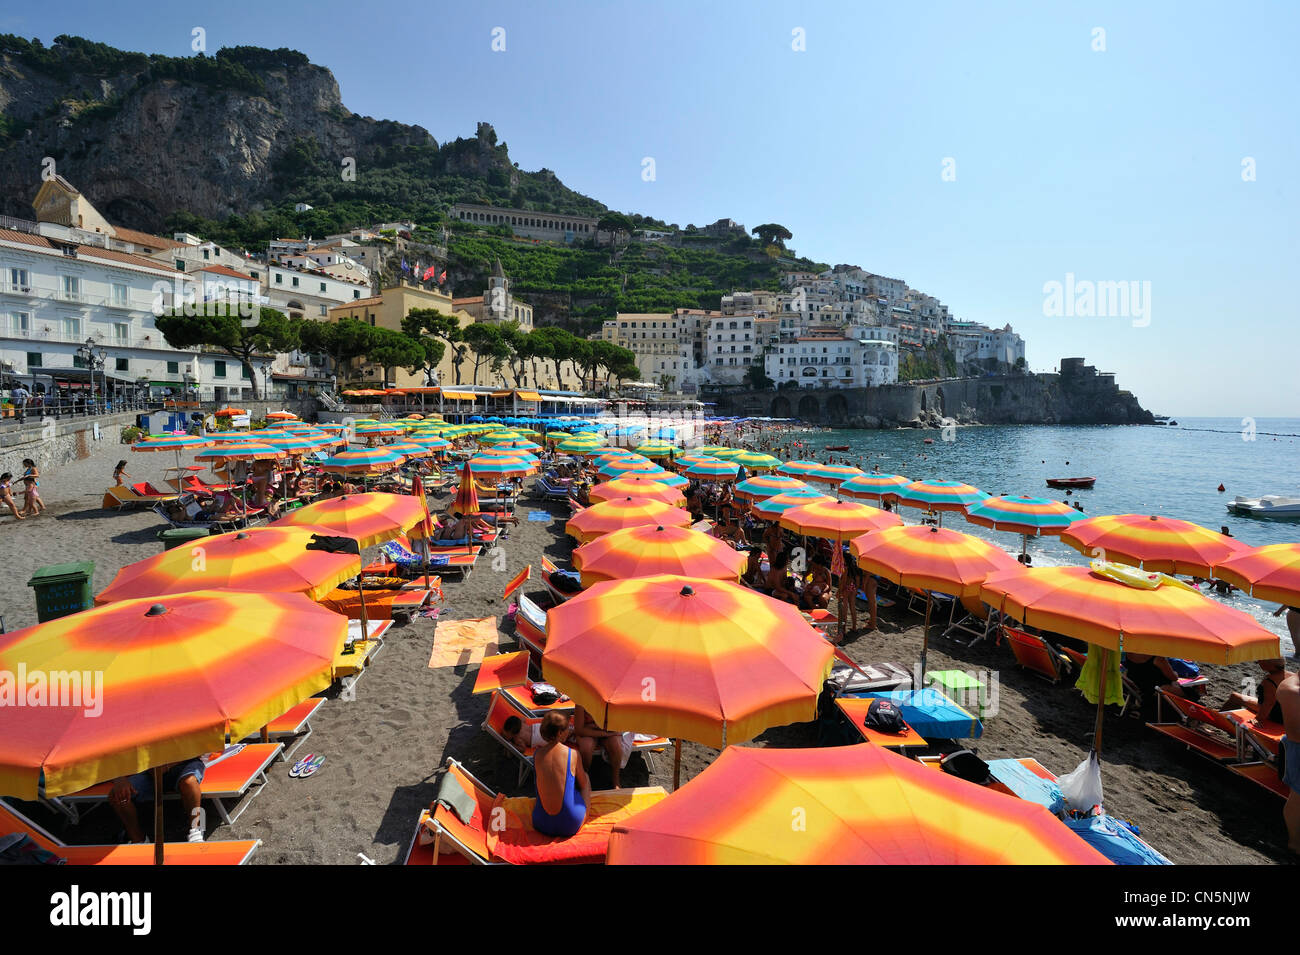 Italy, Campania, Amalfi Coast, listed as World Heritage by UNESCO, Amalfi, the beach - Stock Image